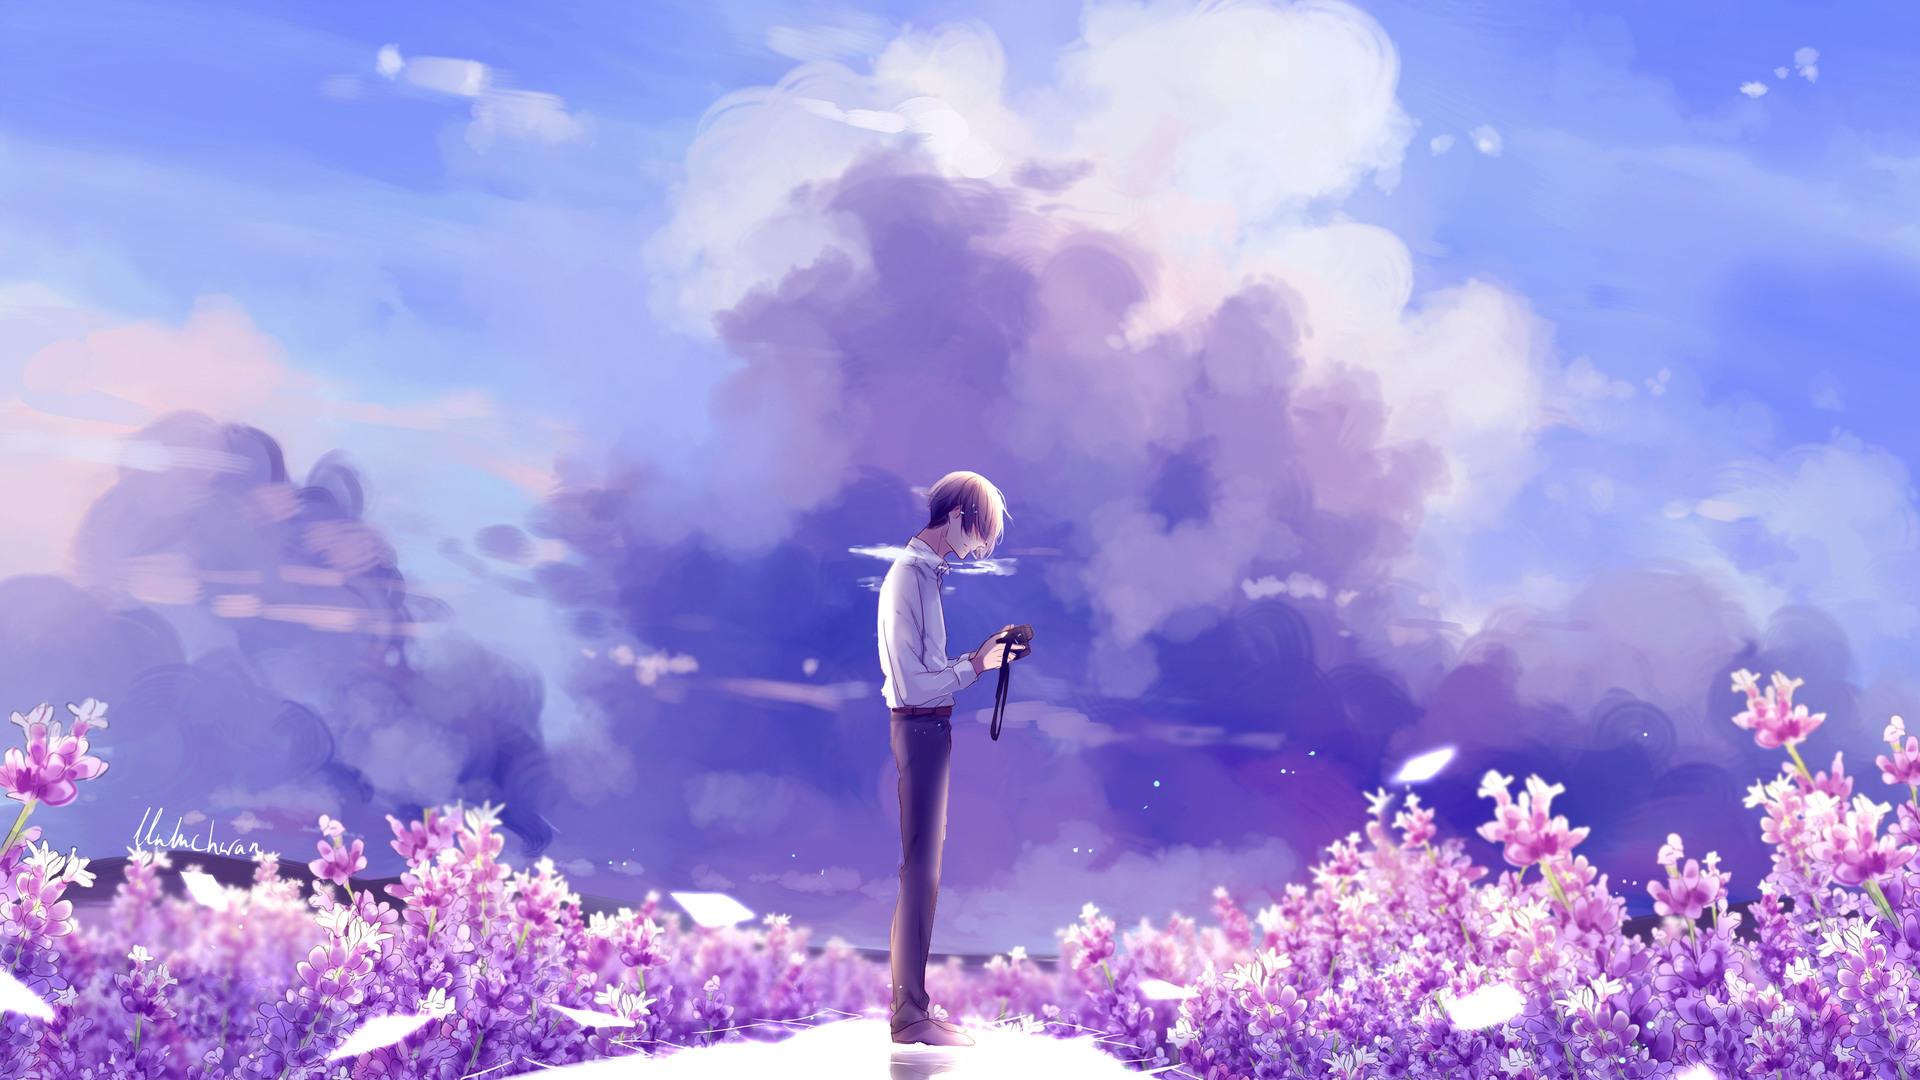 1920x1080 Animeguy Animemanga Clouds Digital Flowers ...